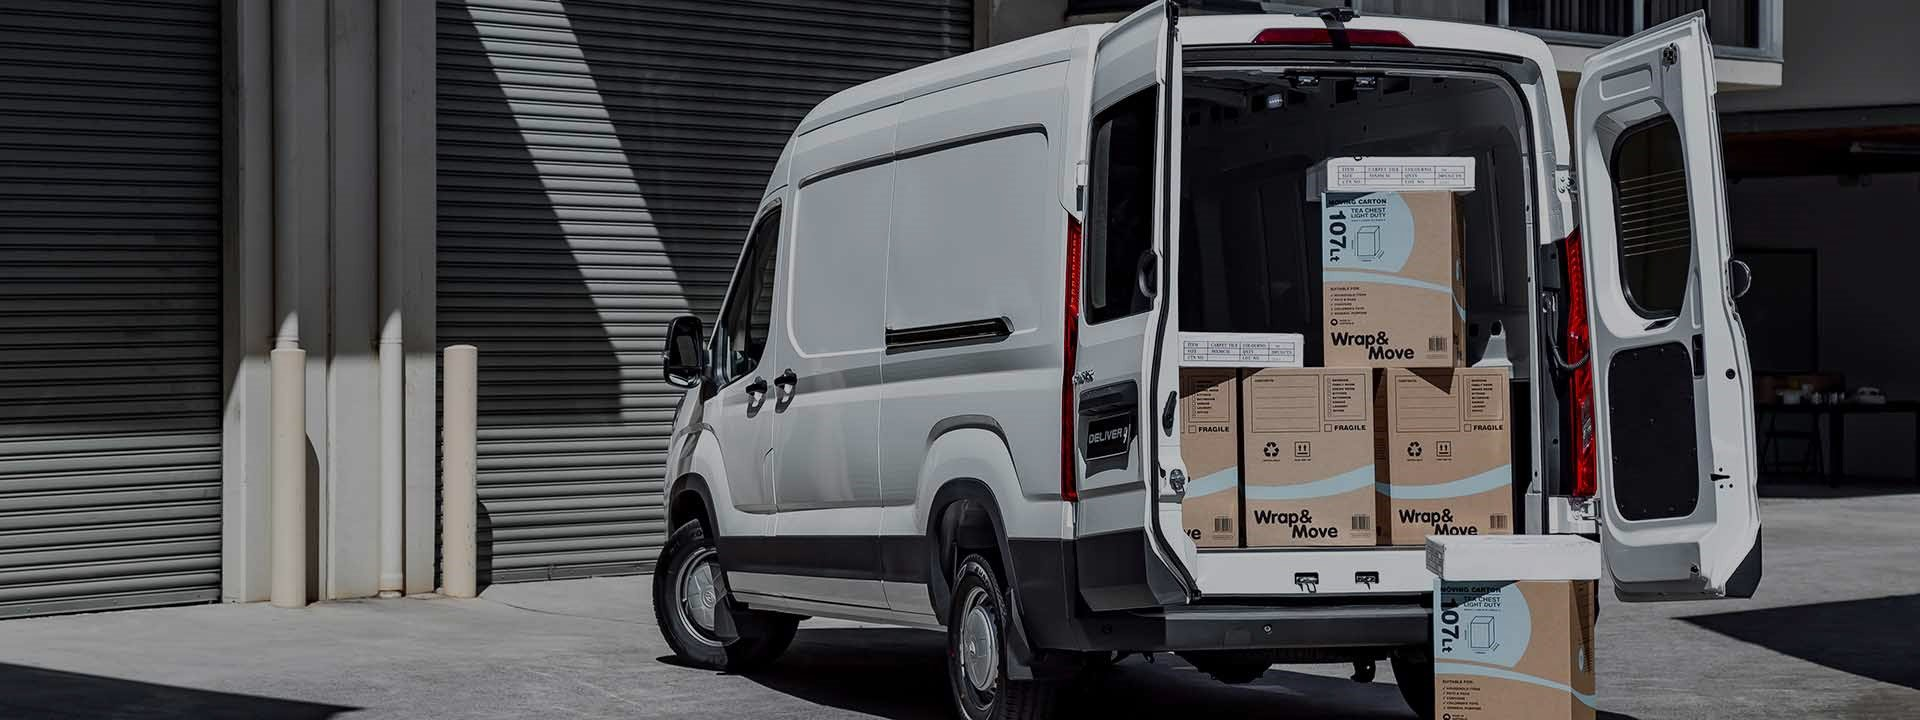 deliver-9-van-cargo